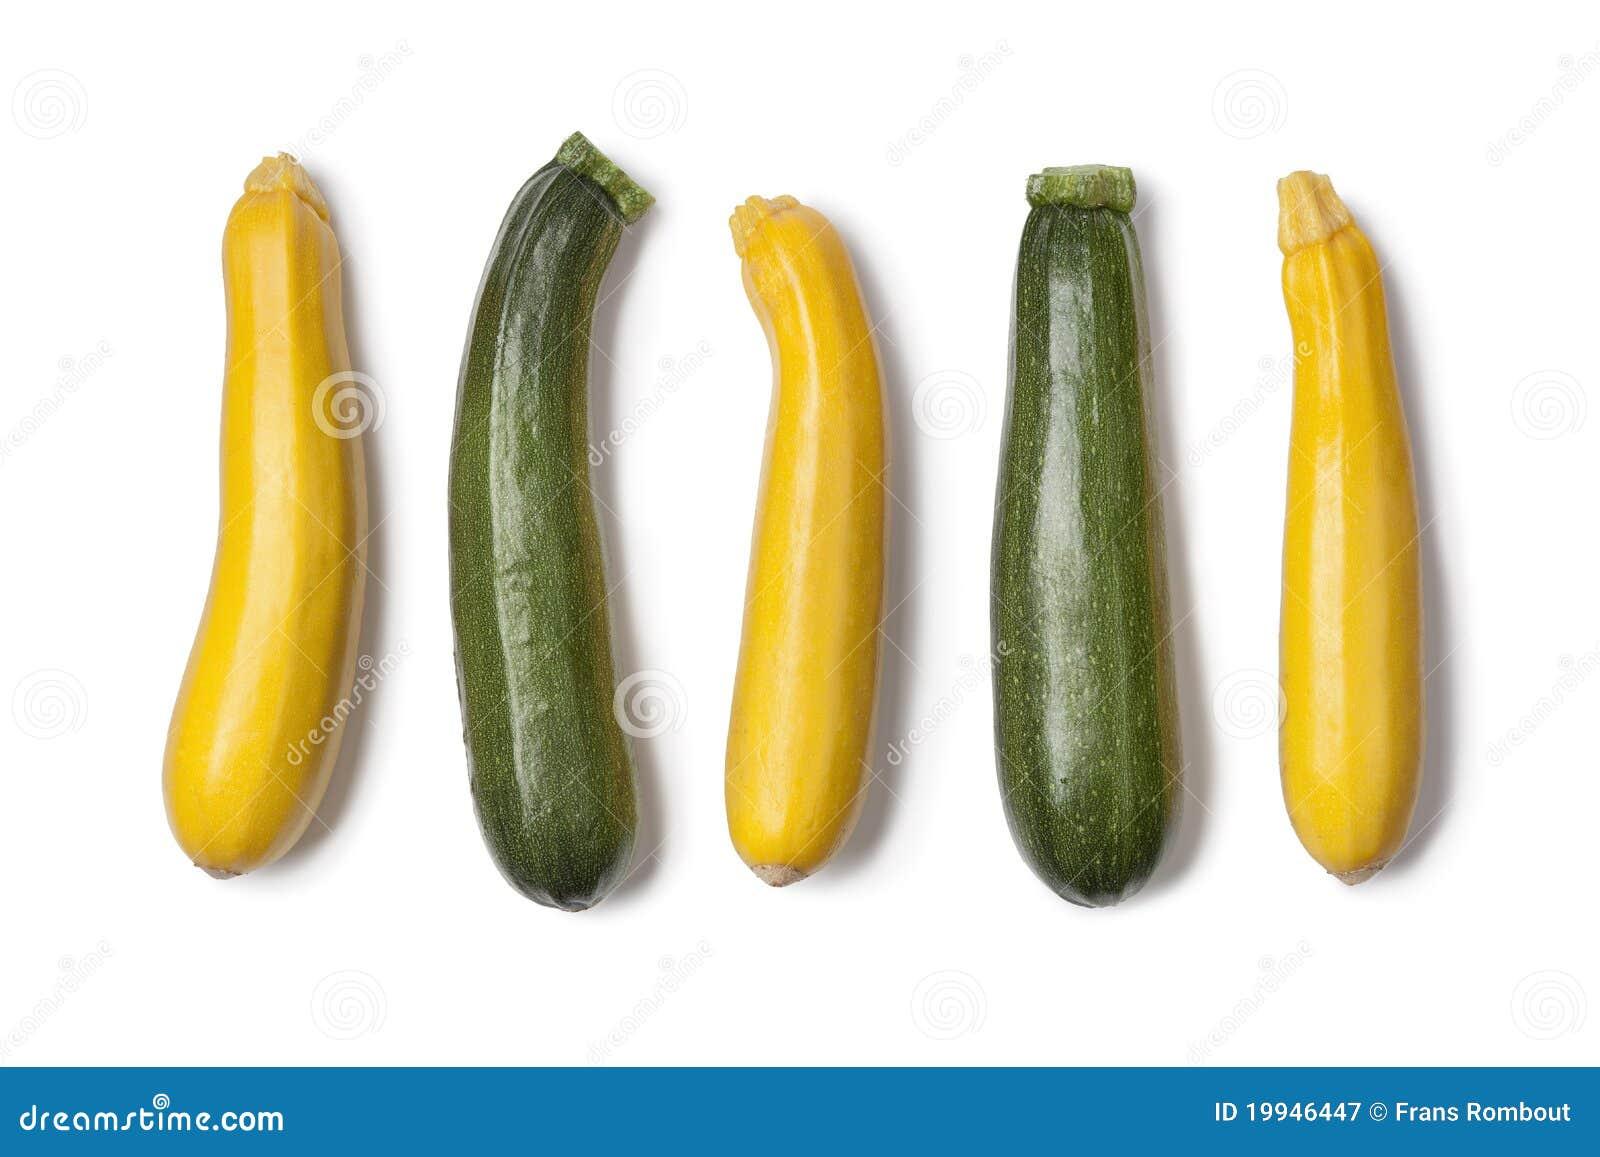 gelbe und gr ne zucchini stock photos royalty free pictures. Black Bedroom Furniture Sets. Home Design Ideas